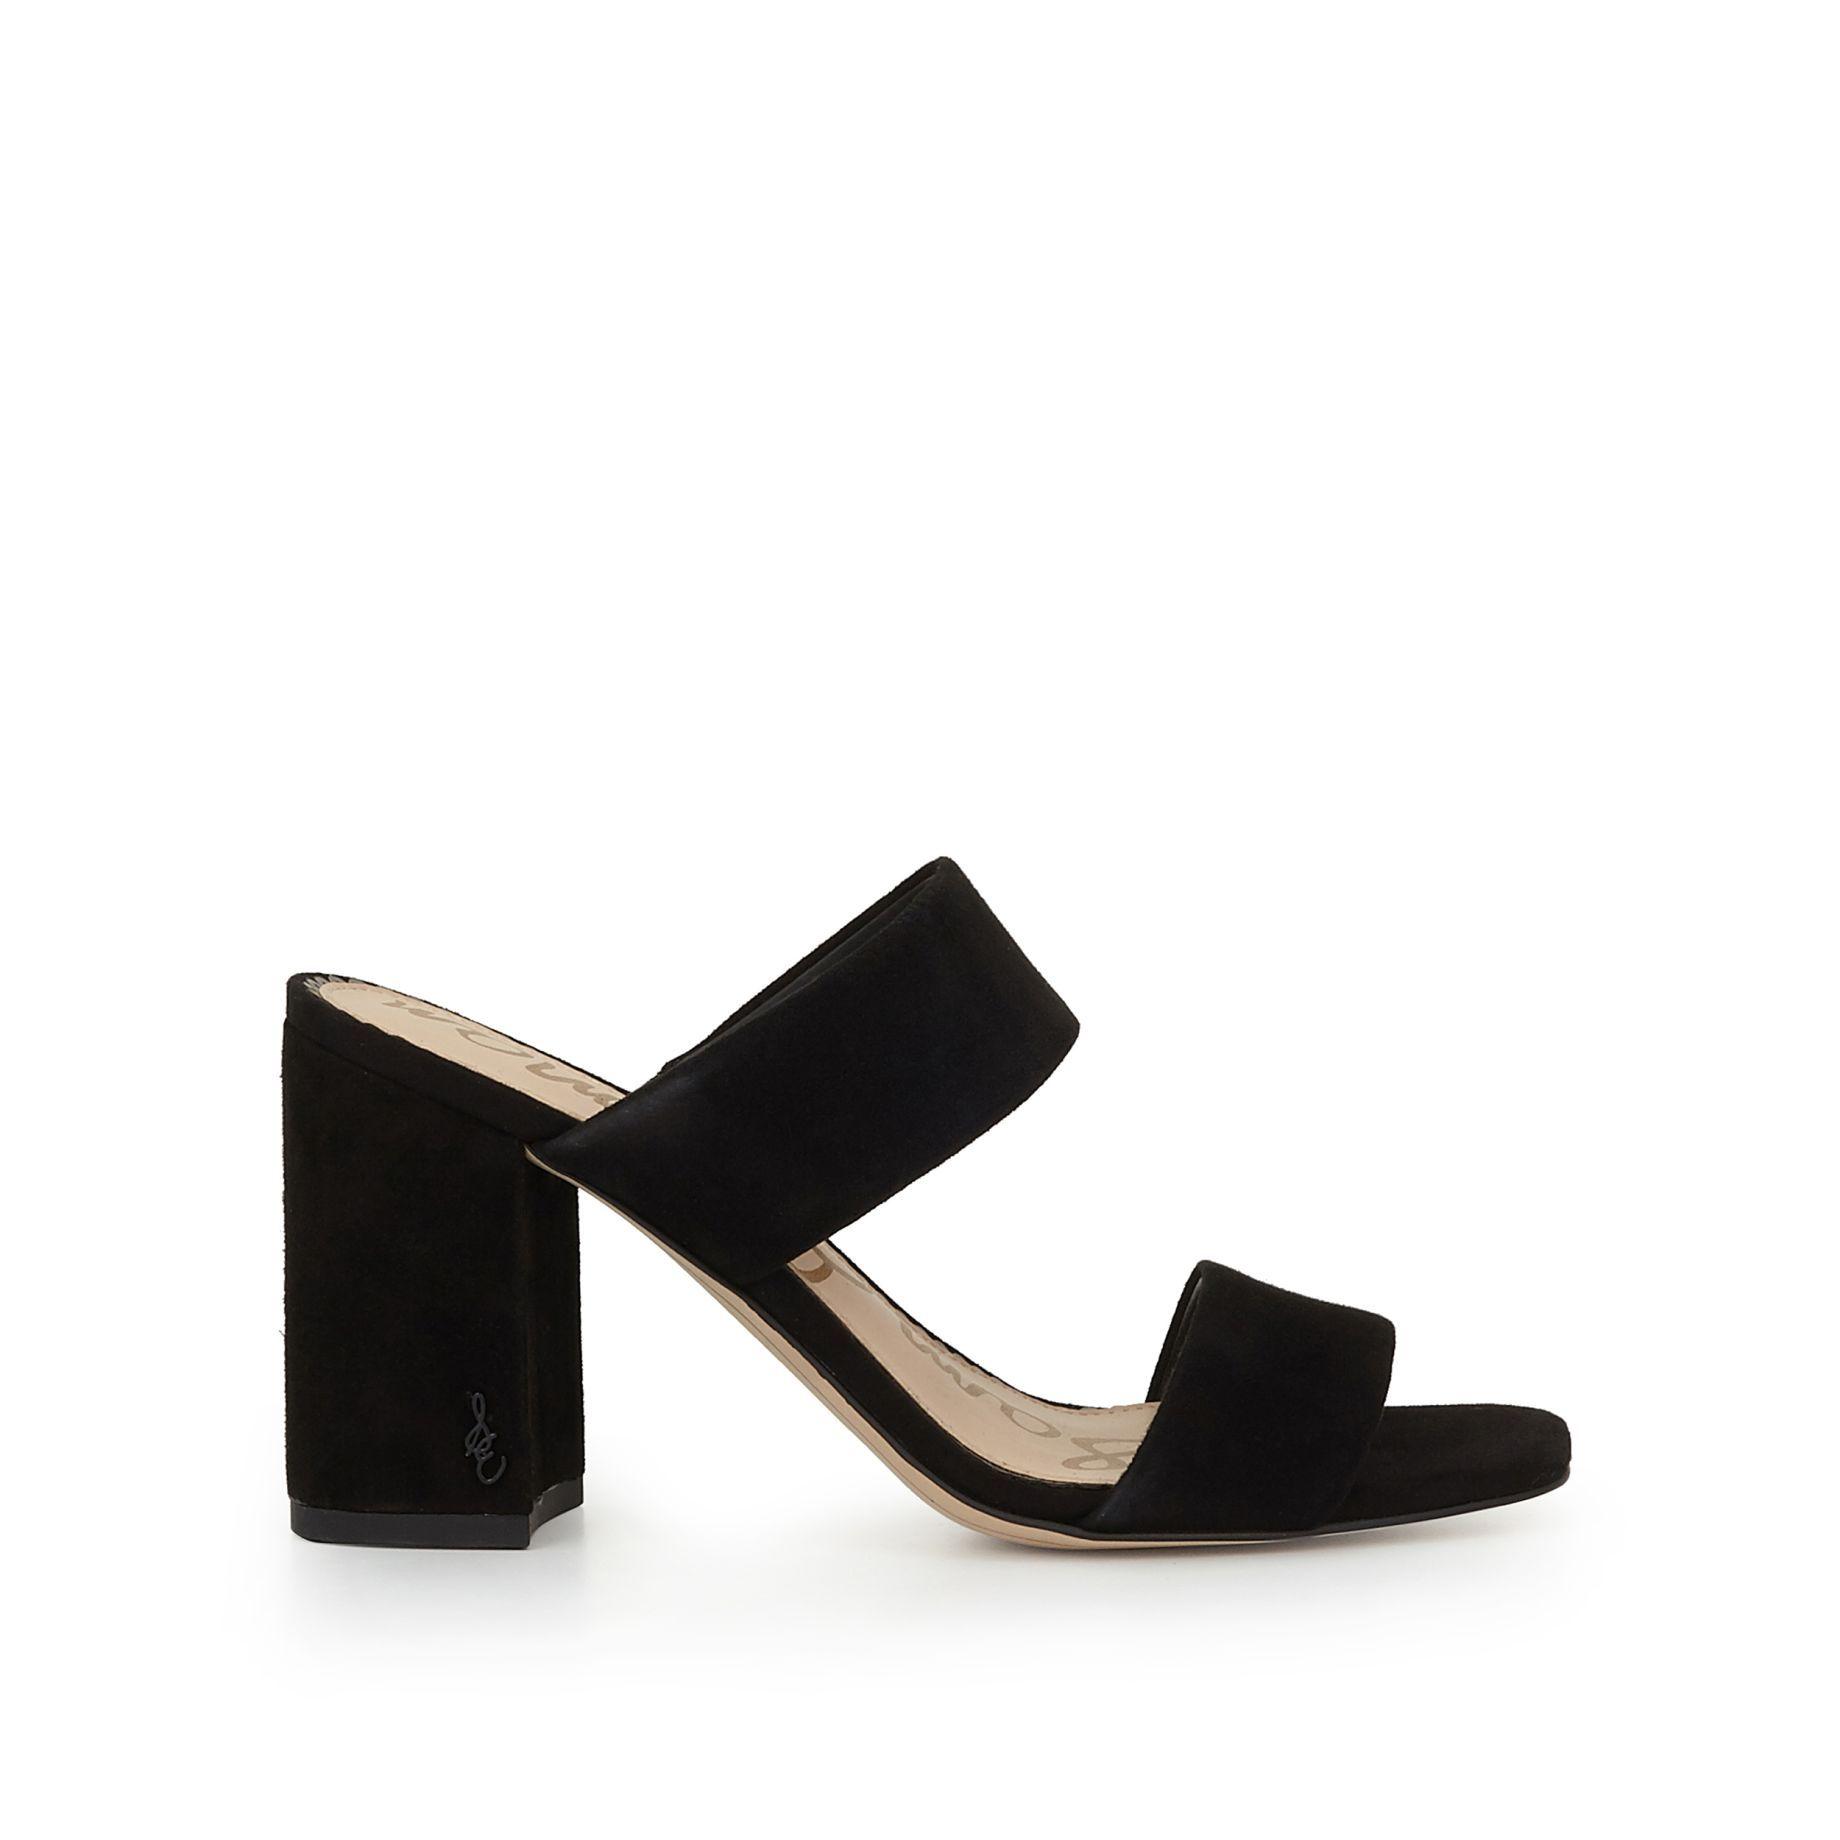 Heeled mules, Heels, Heeled mules sandals